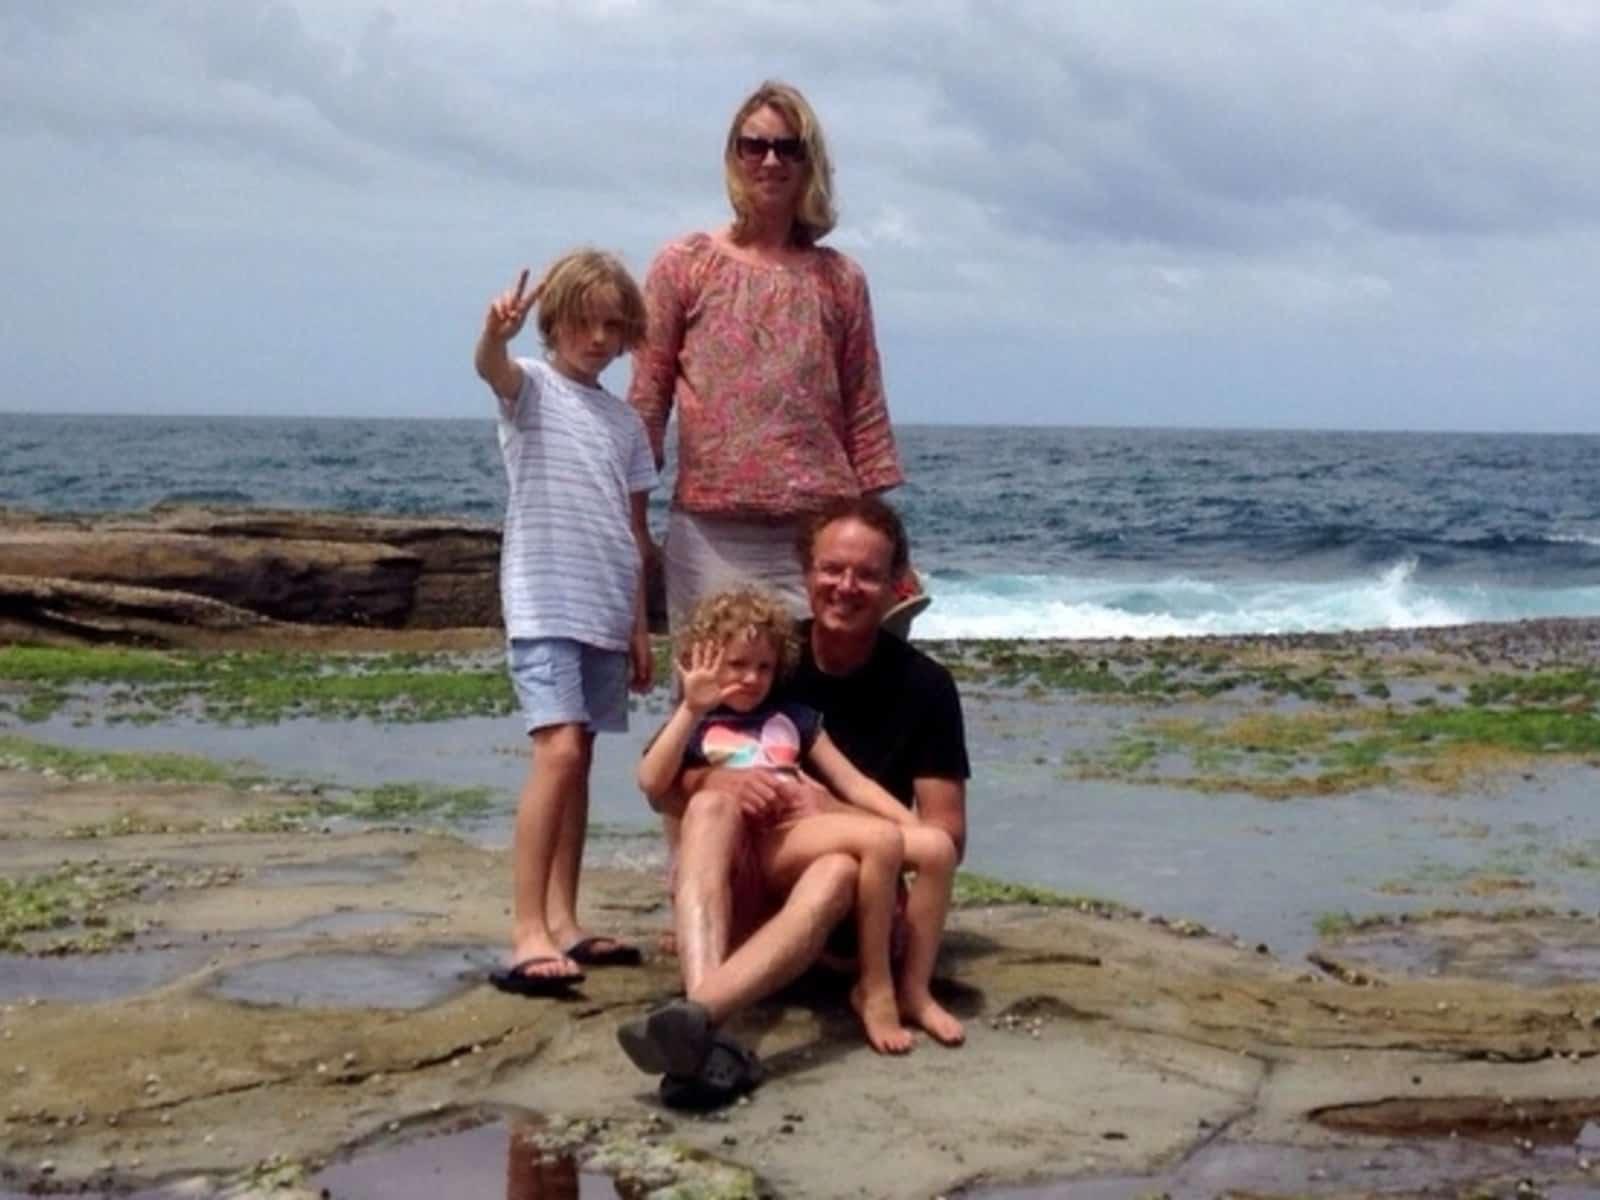 Manuela & Andreas from Sydney, New South Wales, Australia